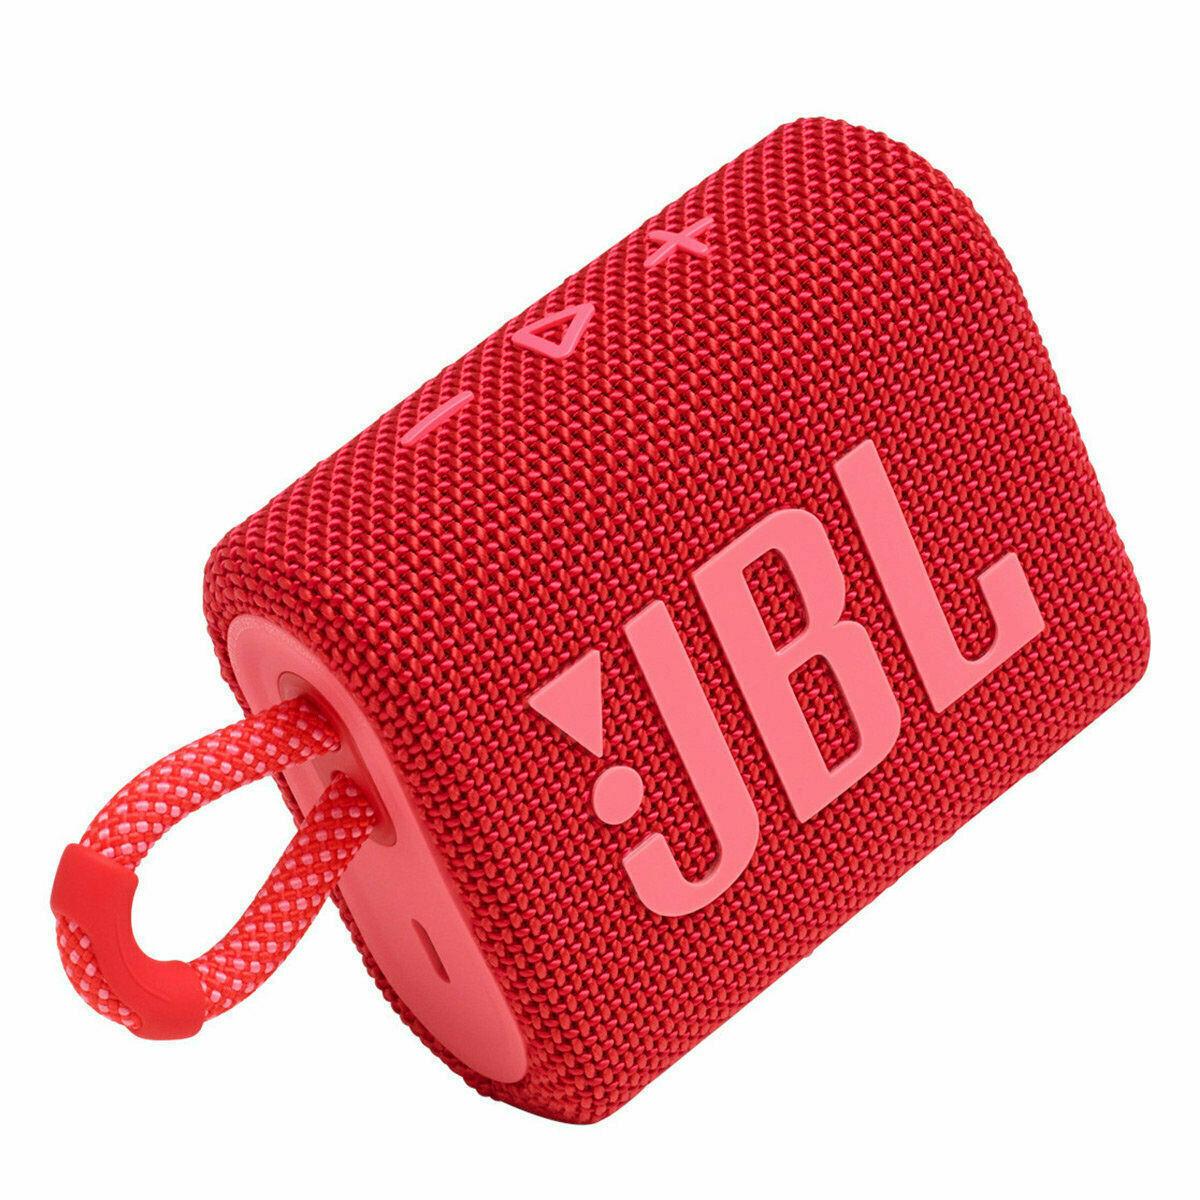 JBL Go 3 Portable Bluetooth Waterproof Speaker  Red at Kapruka Online for specialGifts